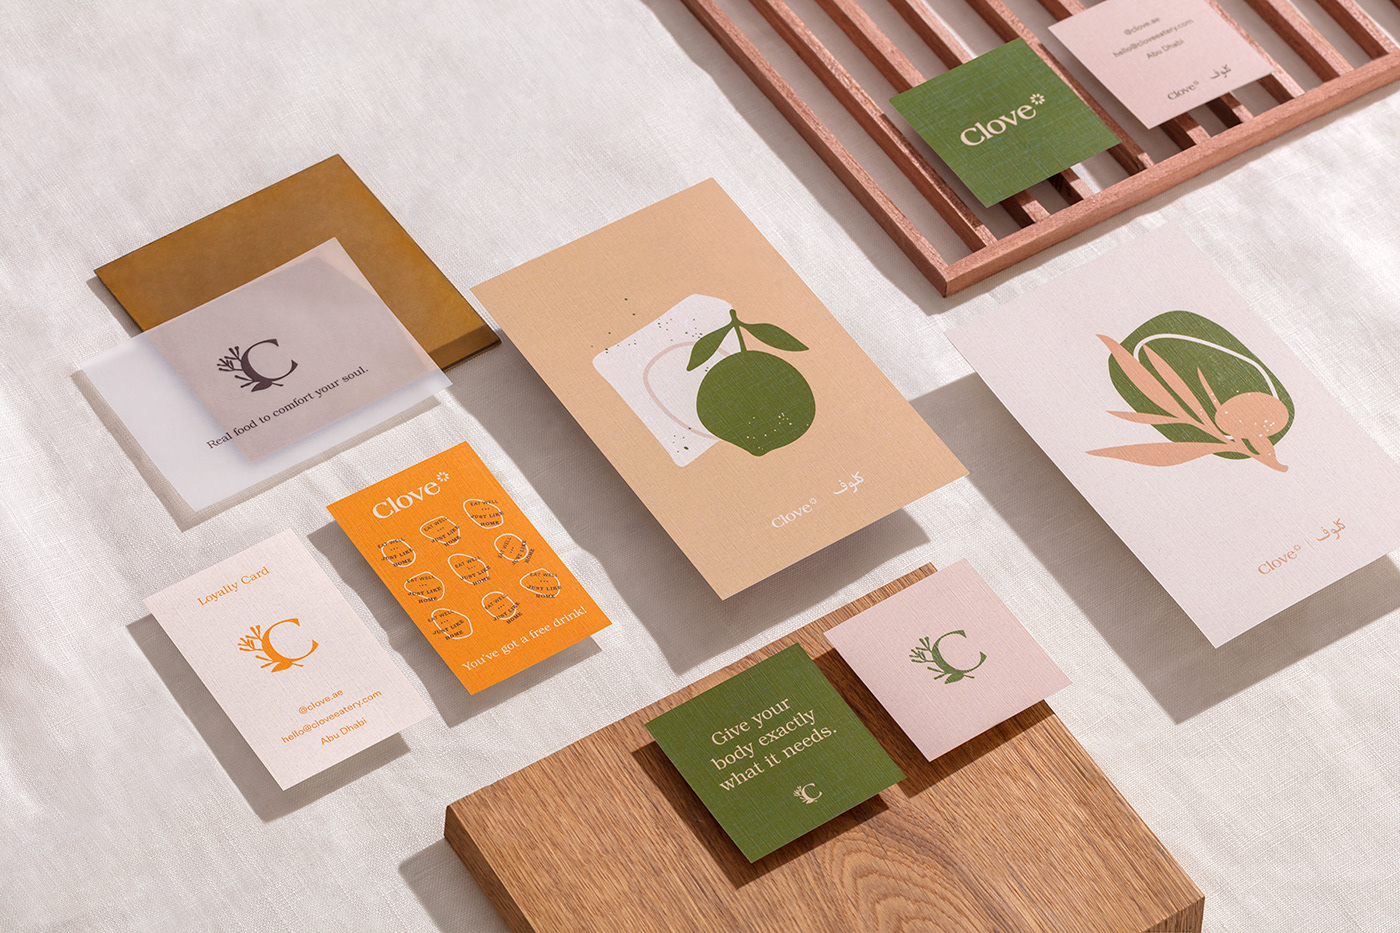 design brand art direction  graphic design  organic restaurant menu ILLUSTRATION  texture